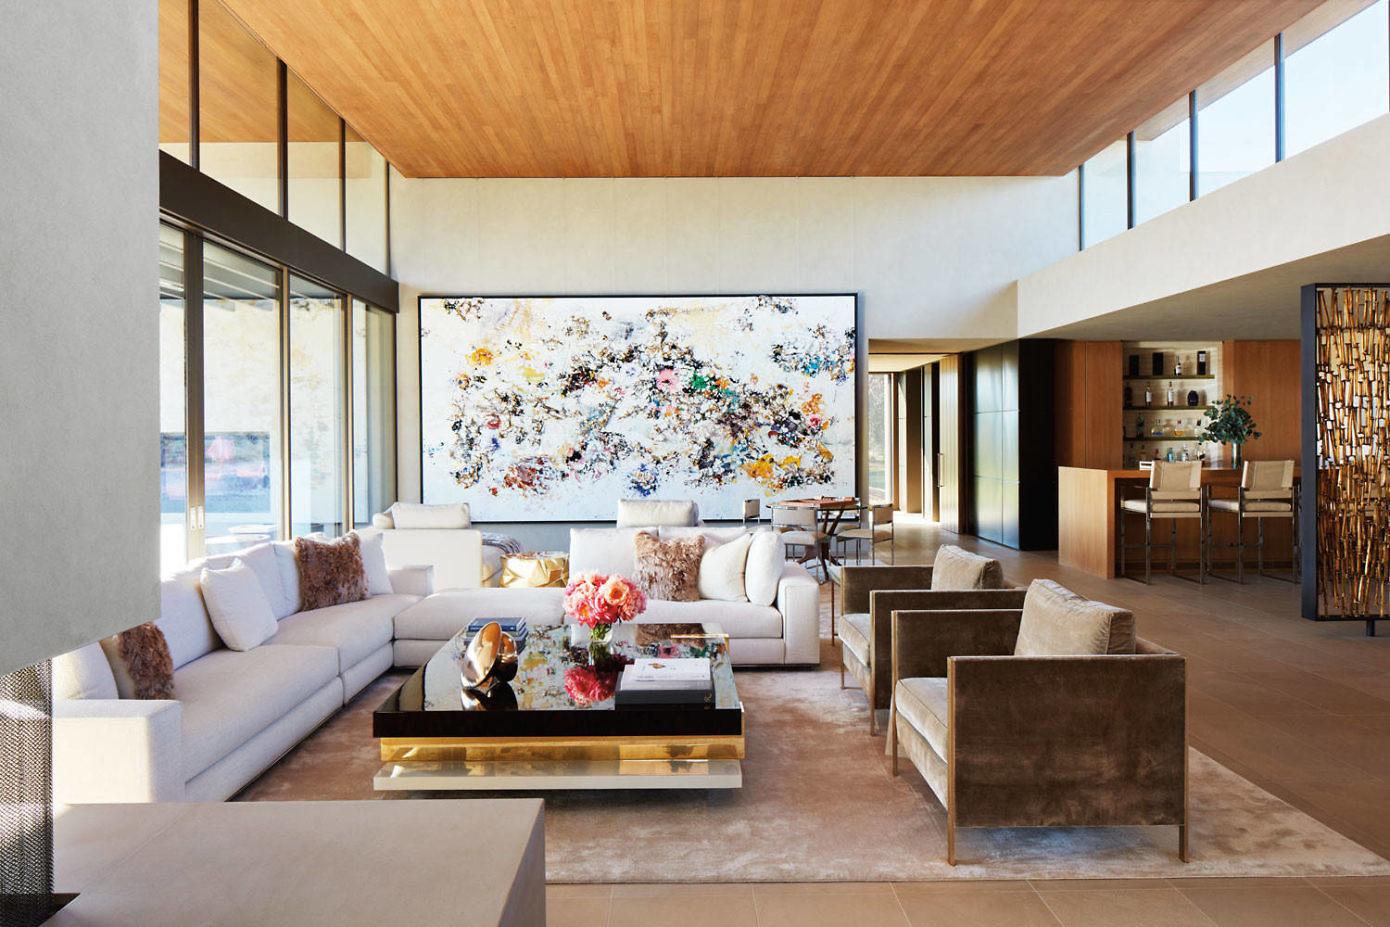 La Quinta Residence By Marmol Radziner Homeadore